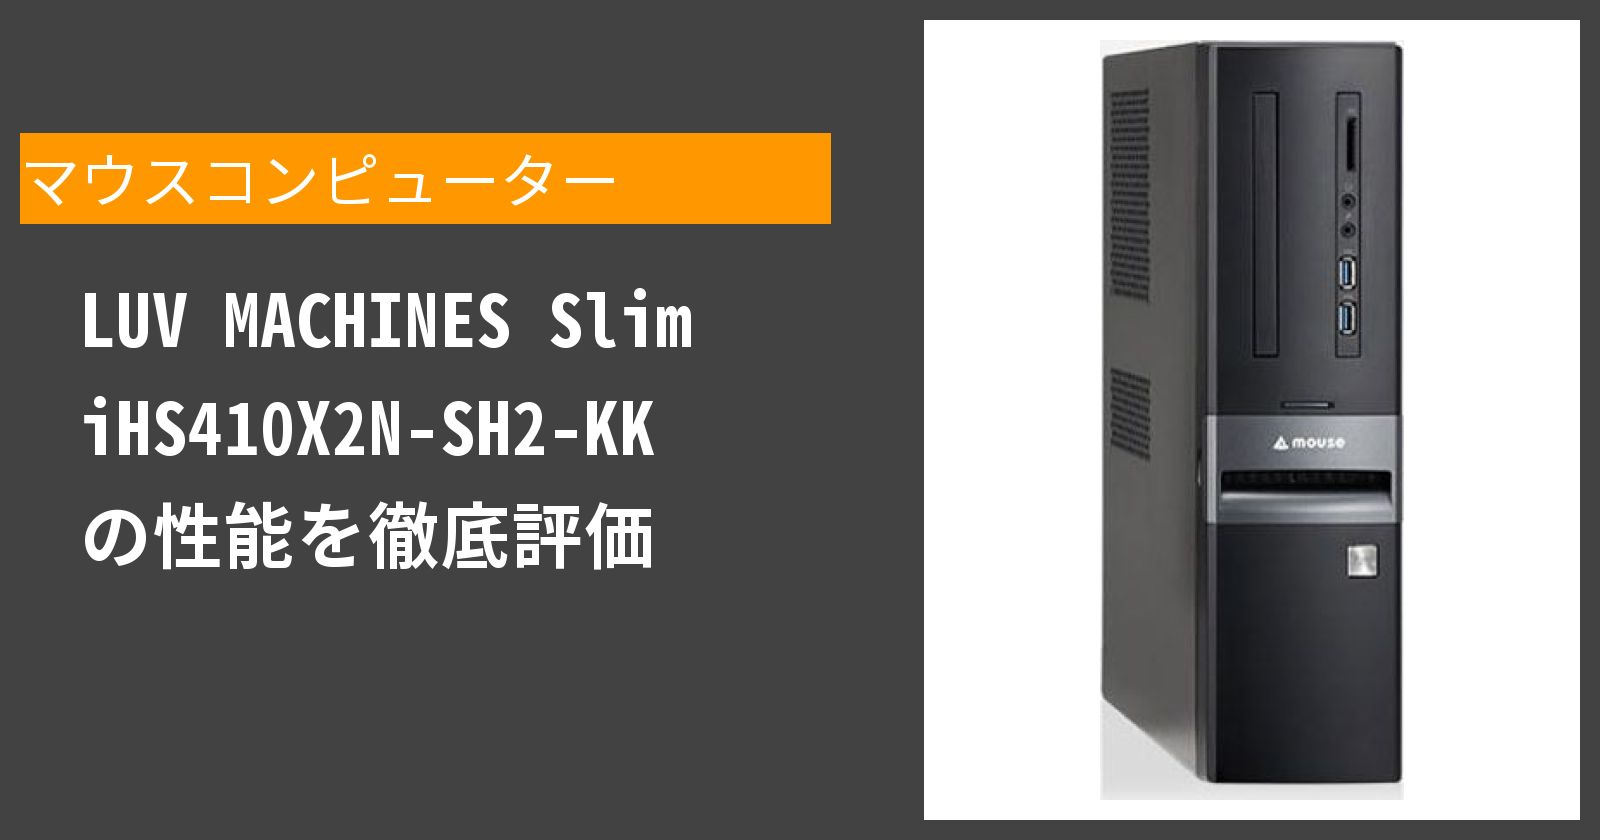 LUV MACHINES Slim iHS410X2N-SH2-KK の性能を徹底評価